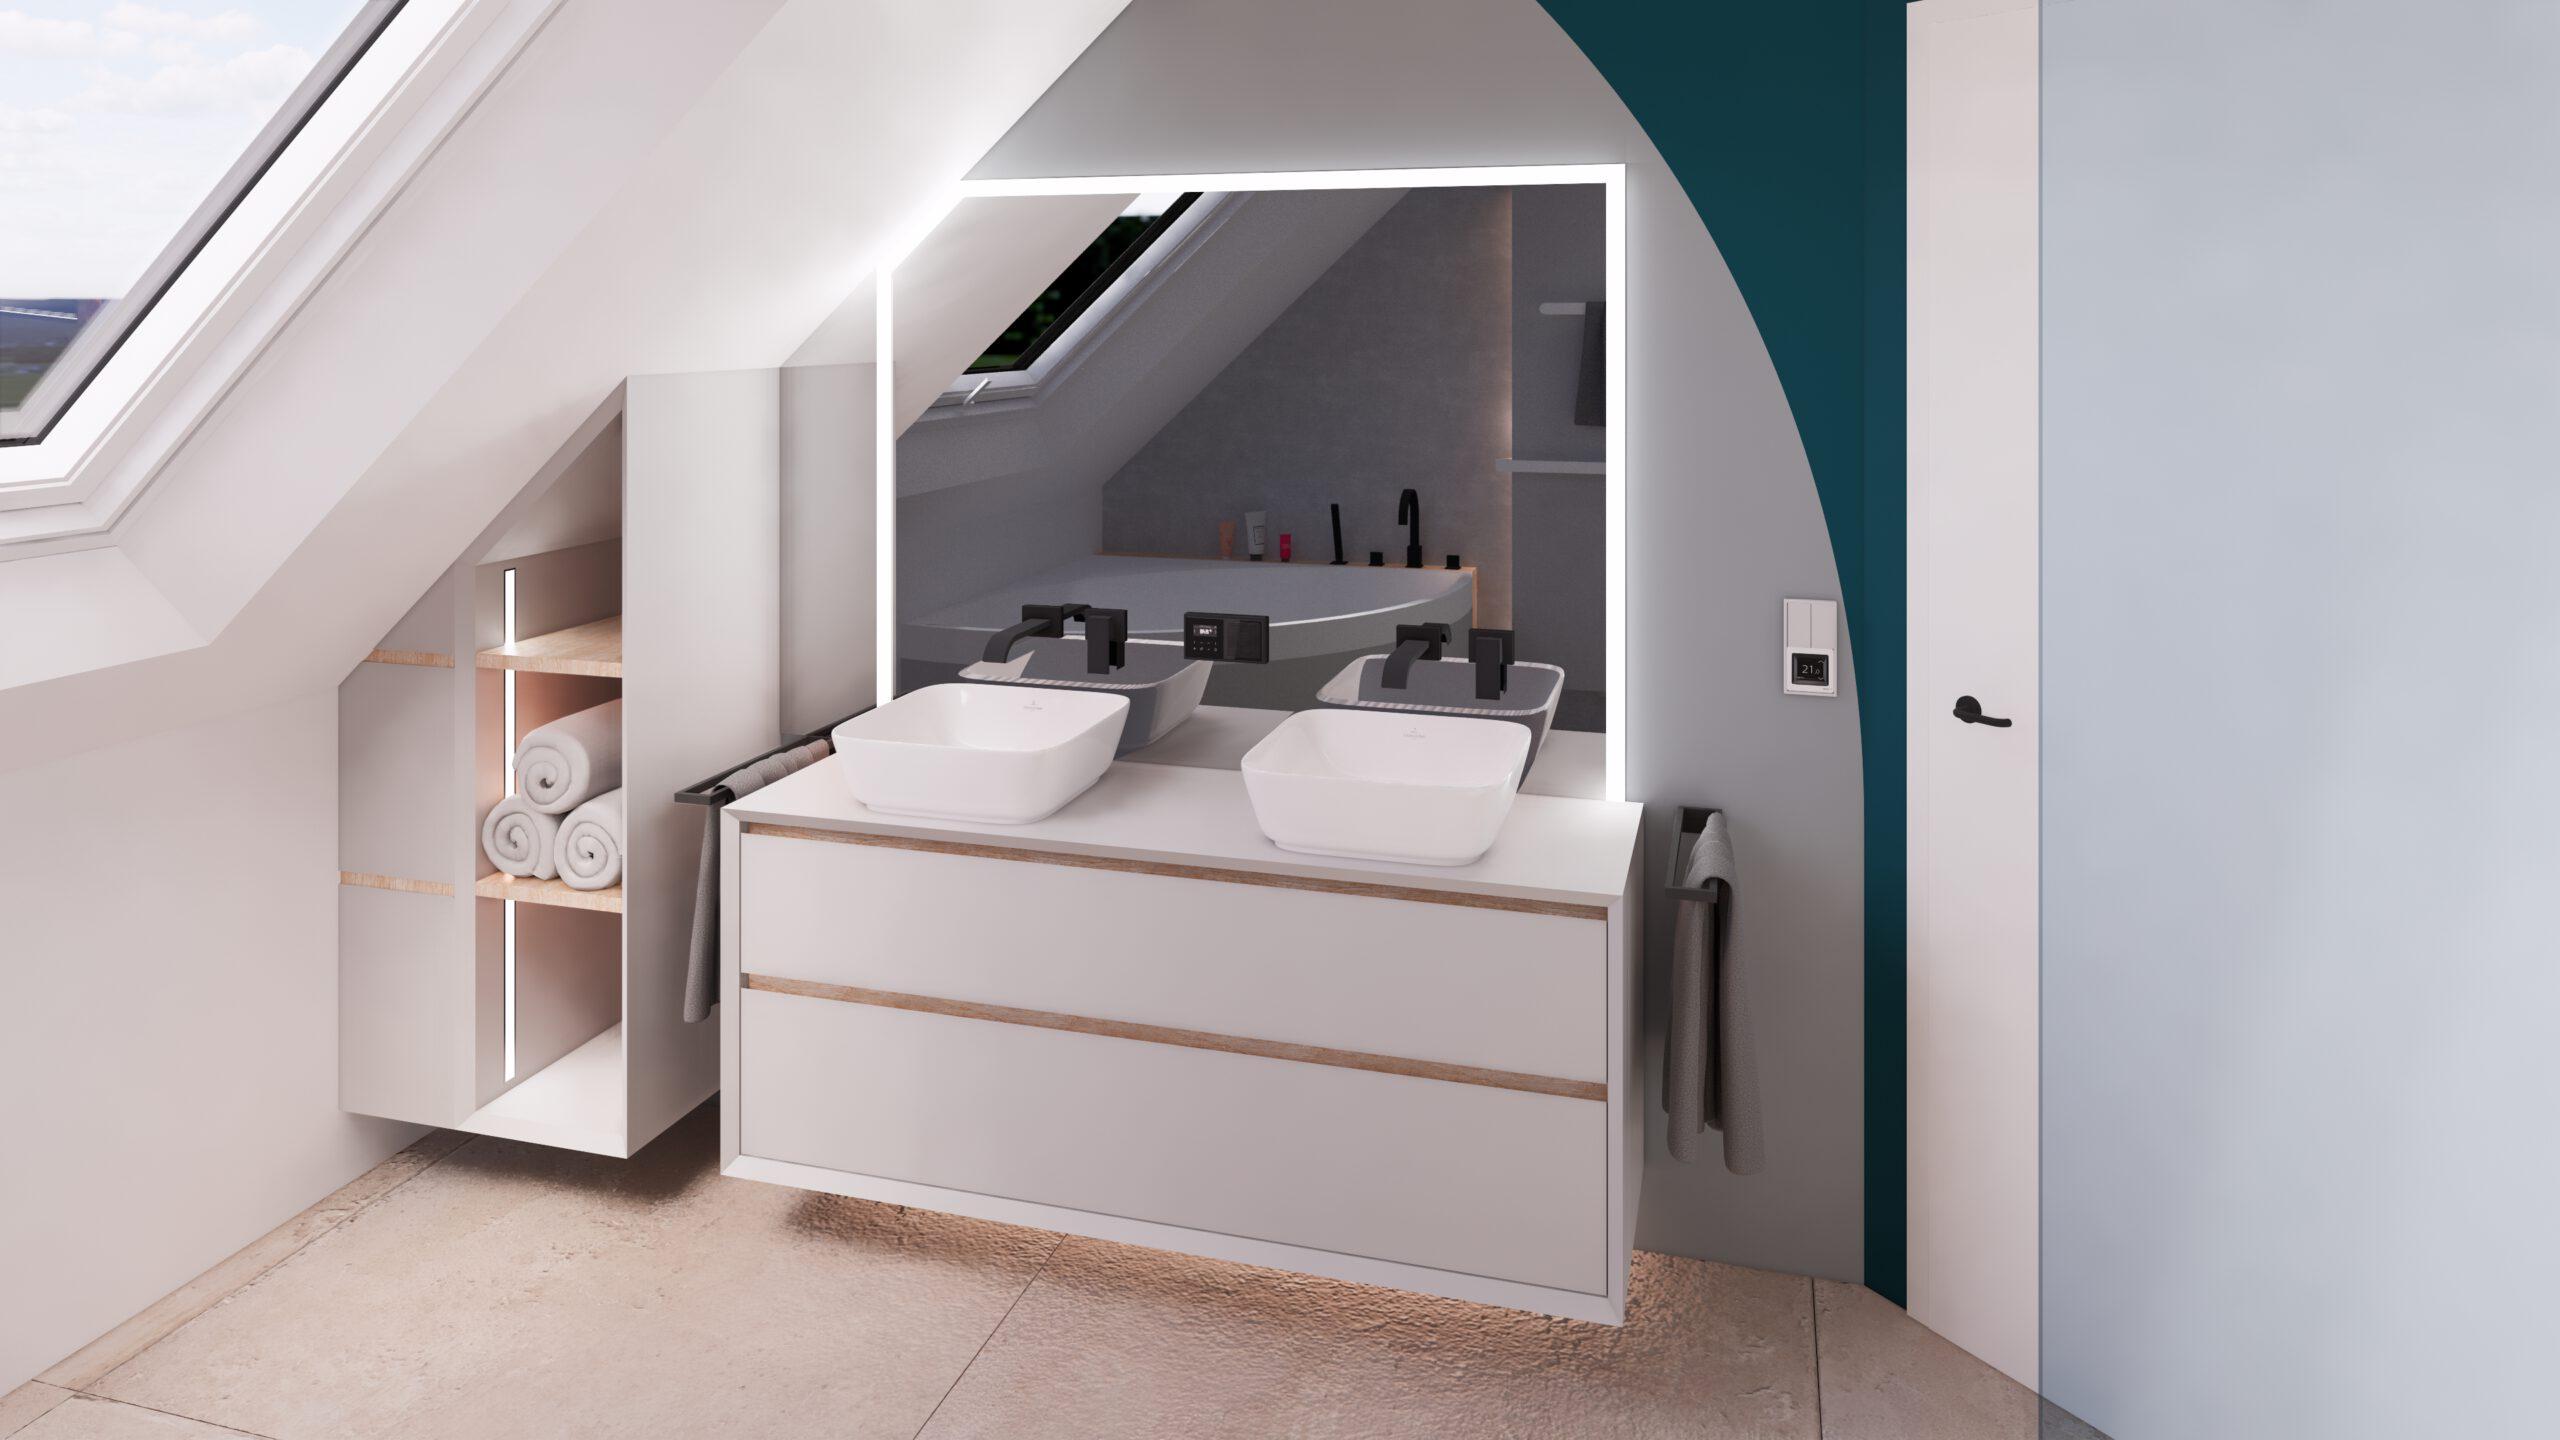 Badezimmer Spiegel Waschtisch Waschbecken Steinberger Amaturen Jung Holz LED